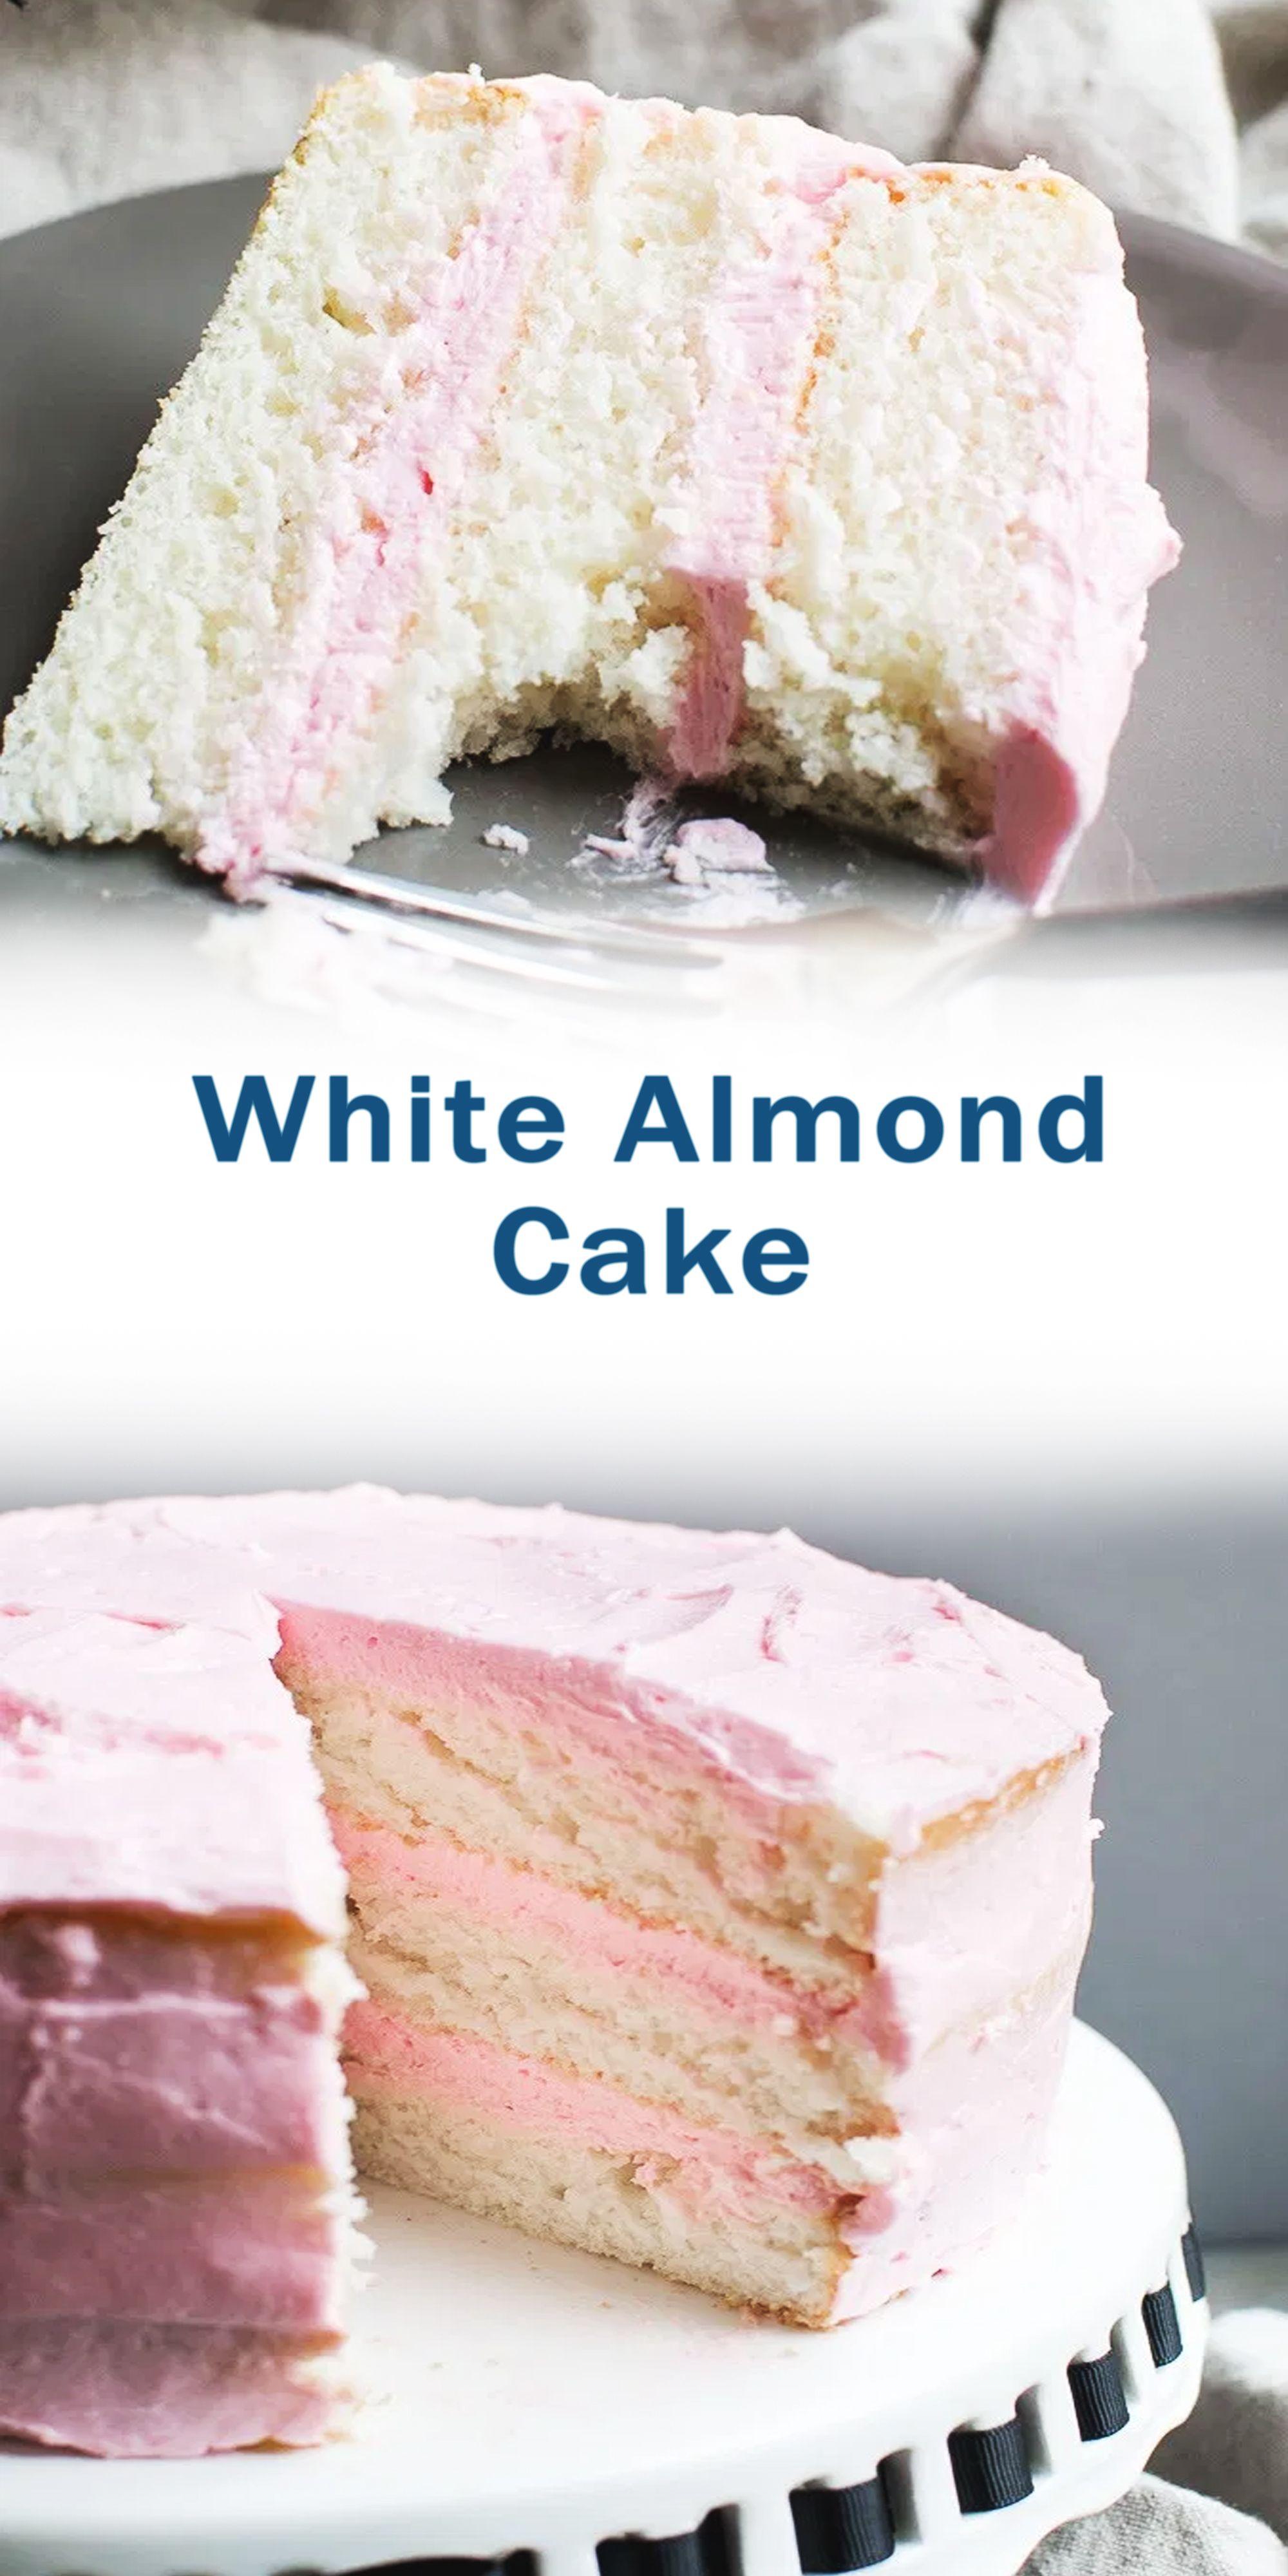 White Almond Cake In 2020 Almond Cakes French Desserts Chocolate Dessert Recipes